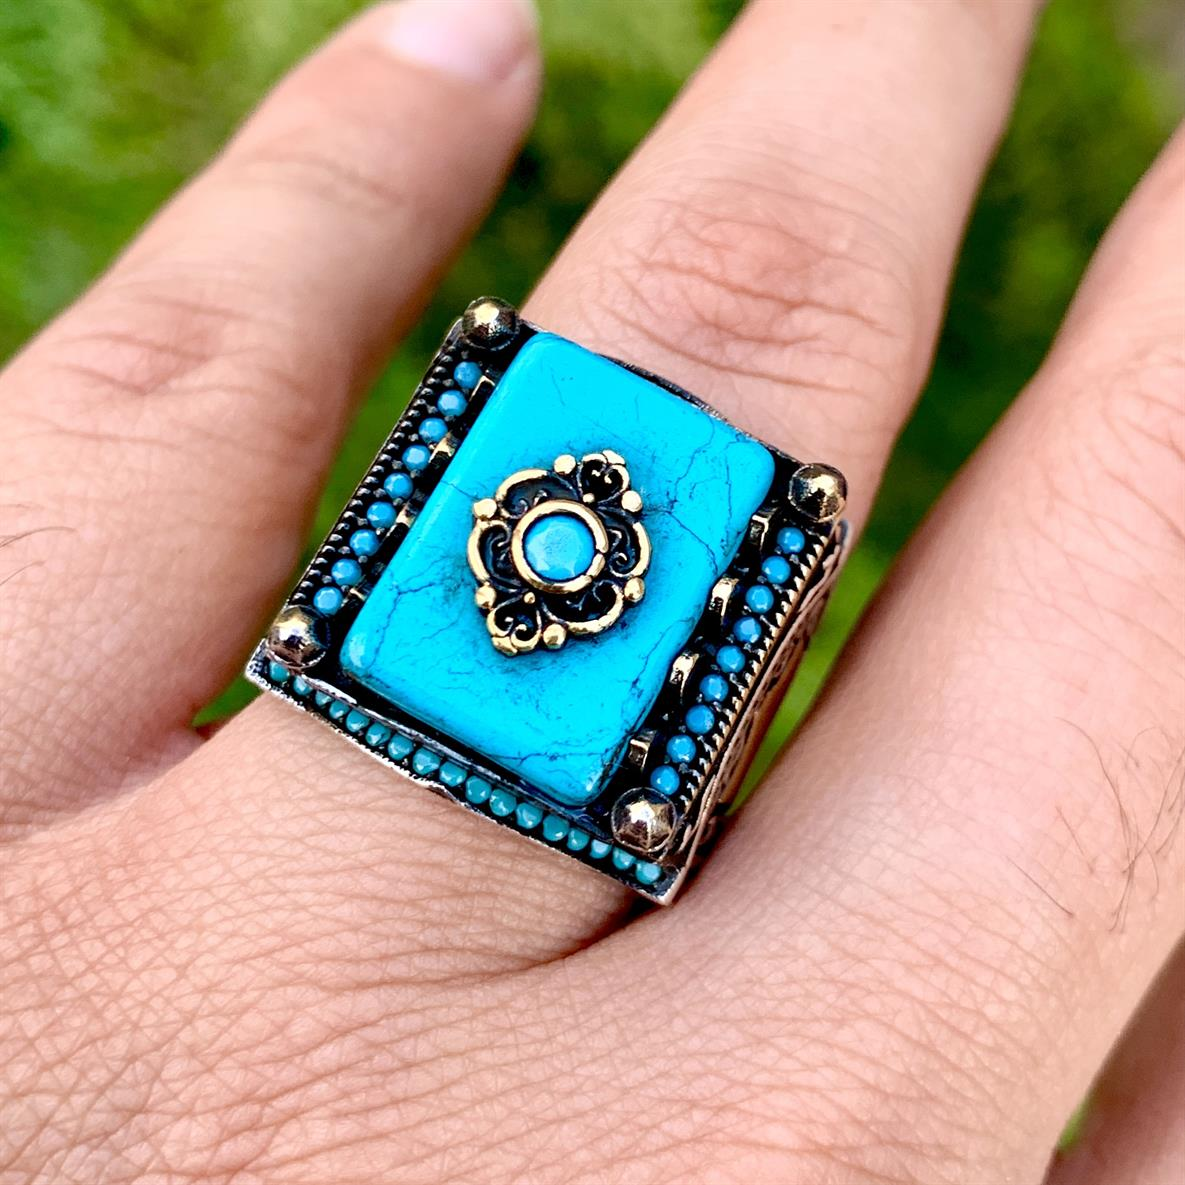 Turkish Rings Luxury 925 Silver 10 natural gemstones pakistan + 925 silver jewelry online